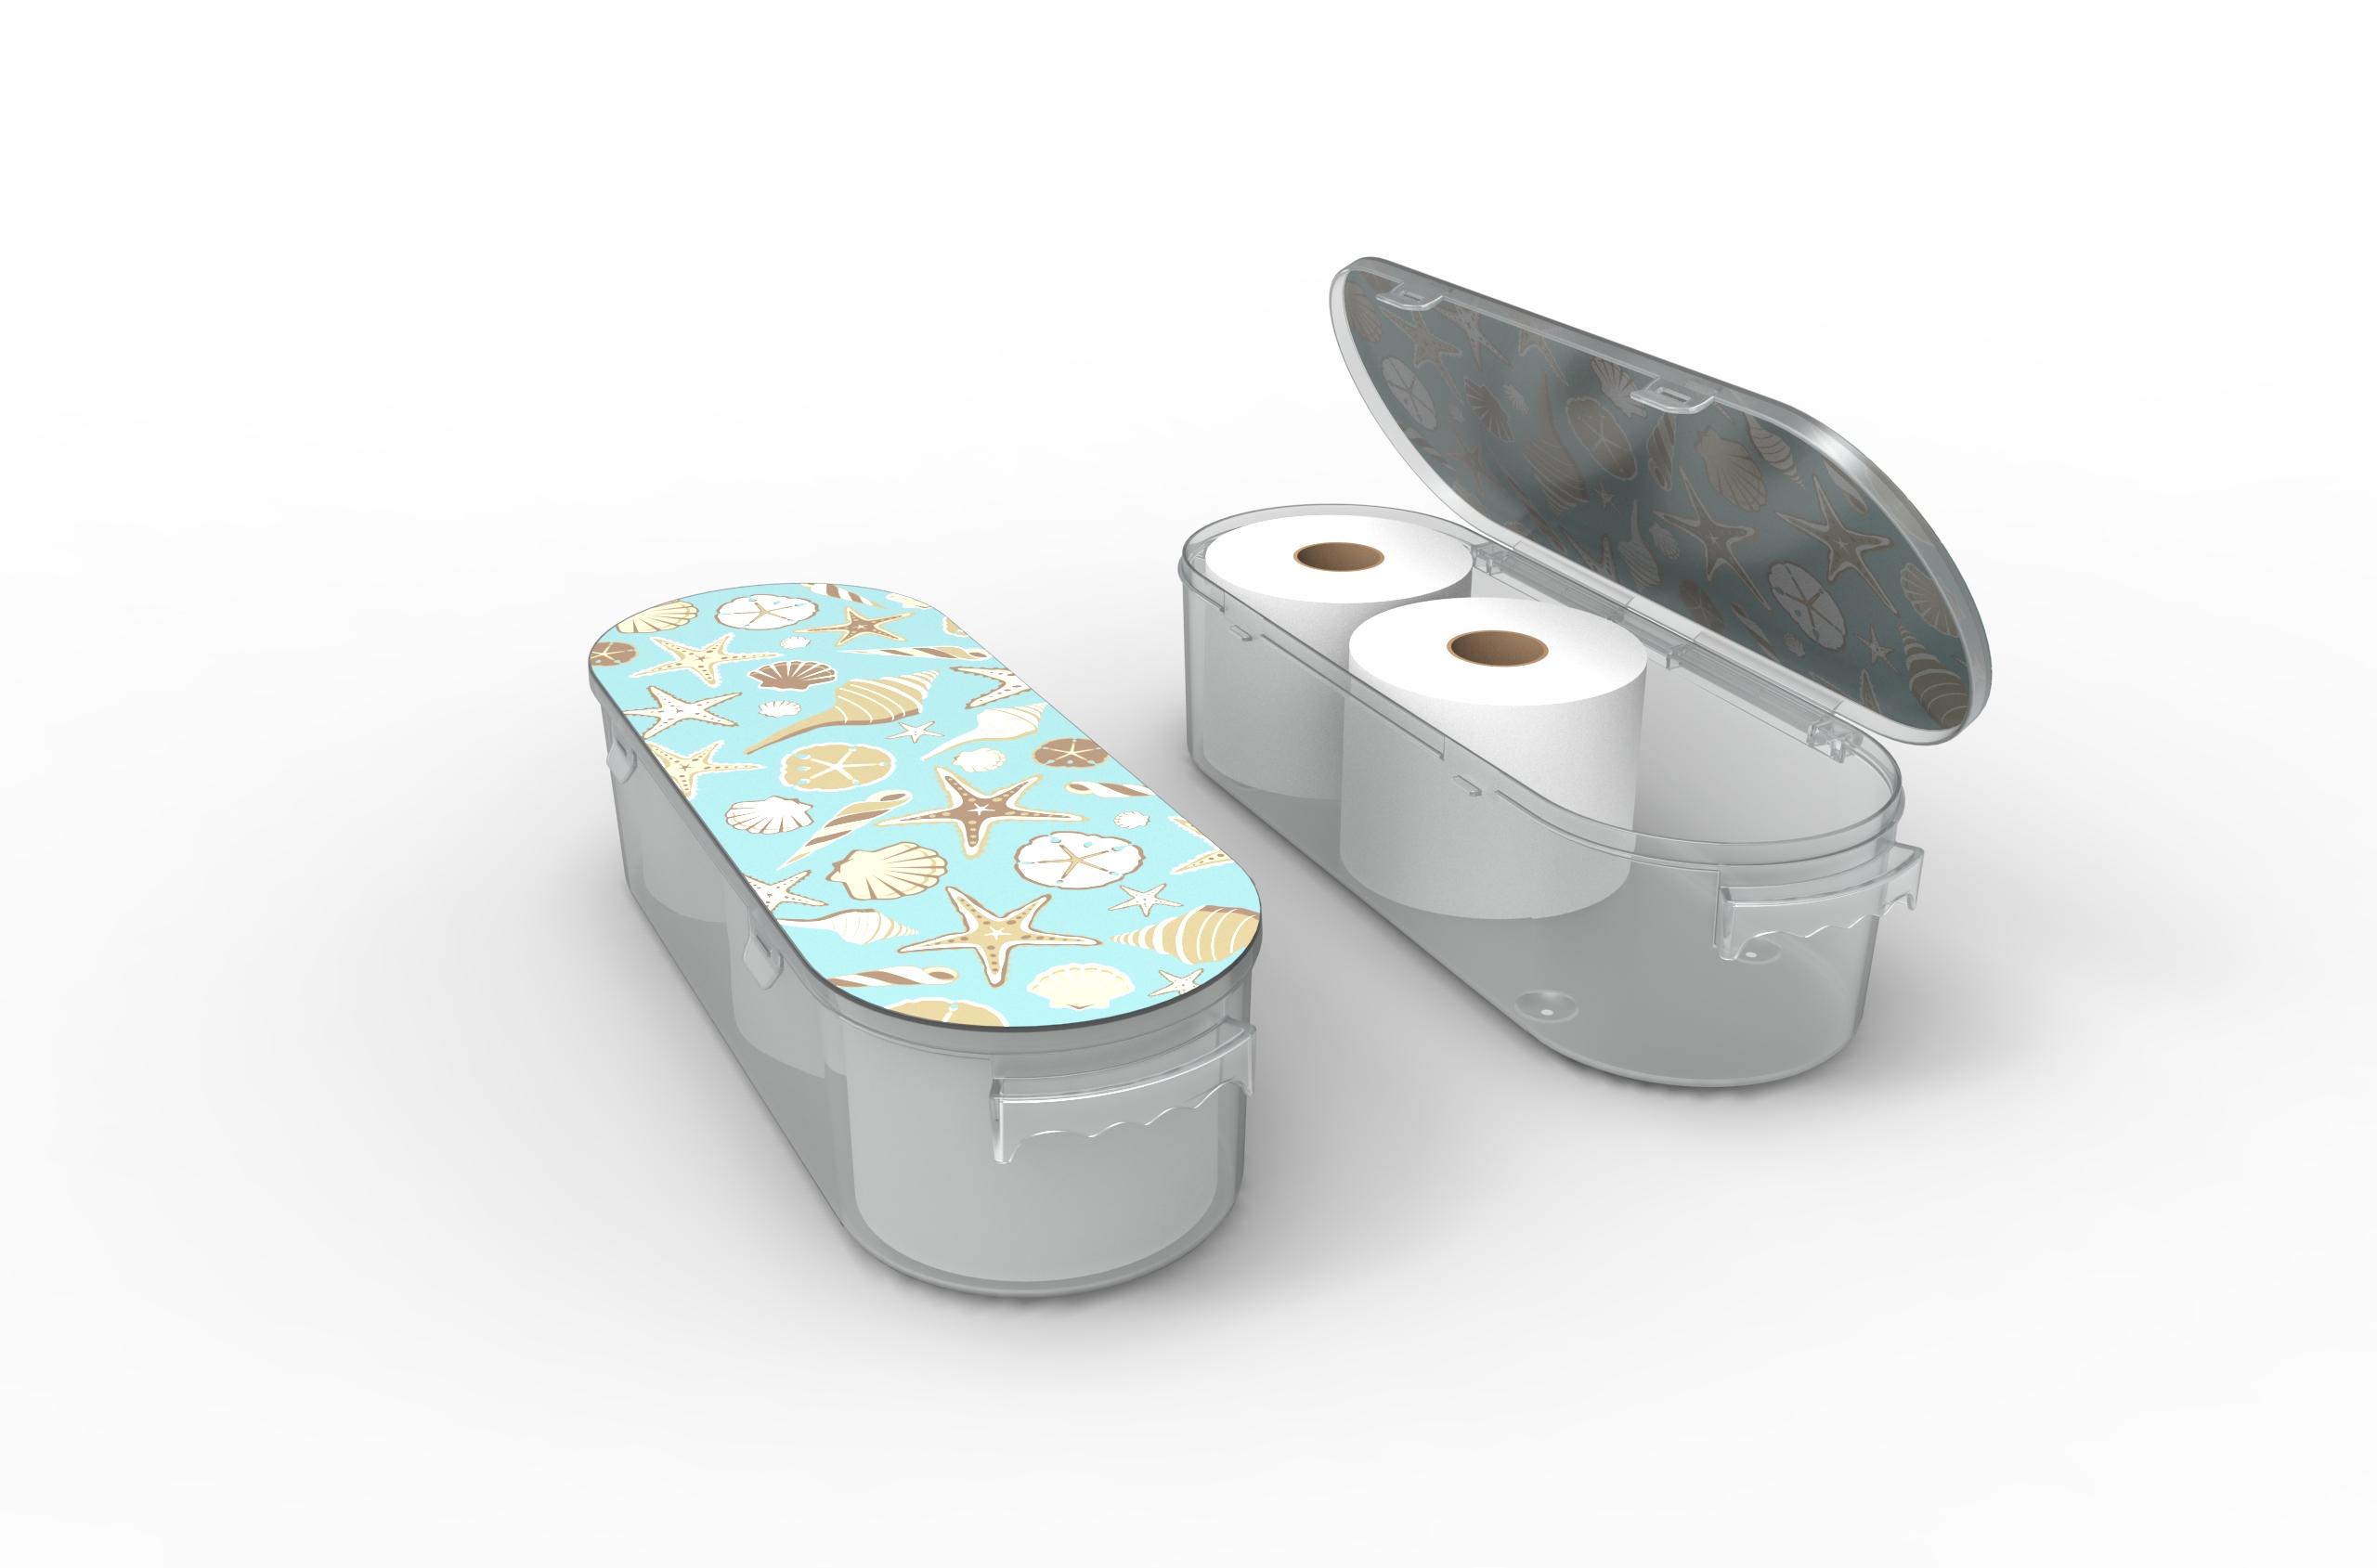 Nykia Designs Bathroom Toilet Paper Storage Solution - Sea Shells